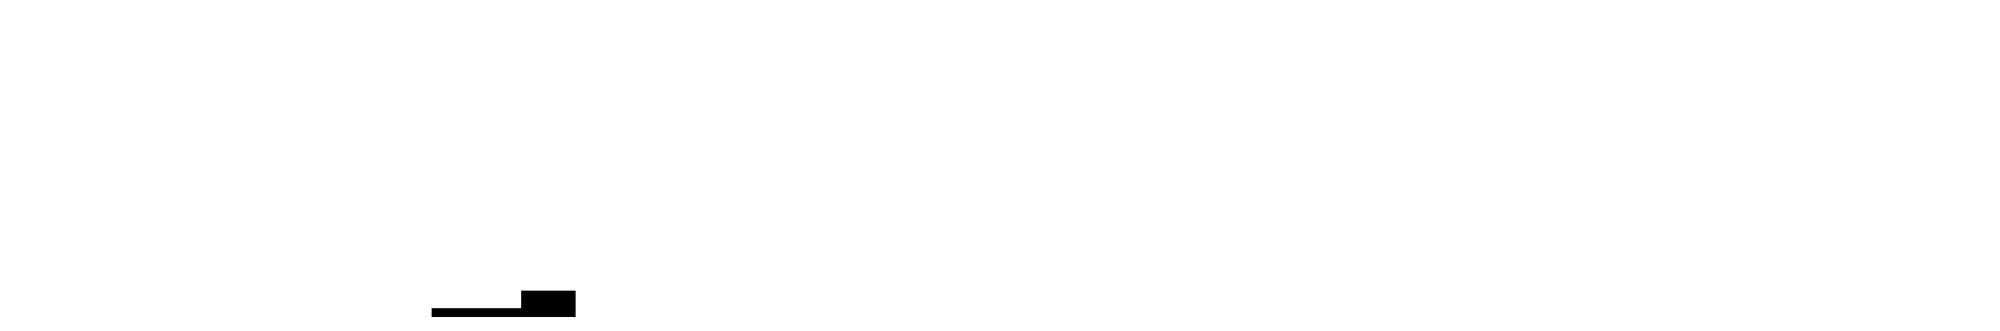 IT-TOTAL